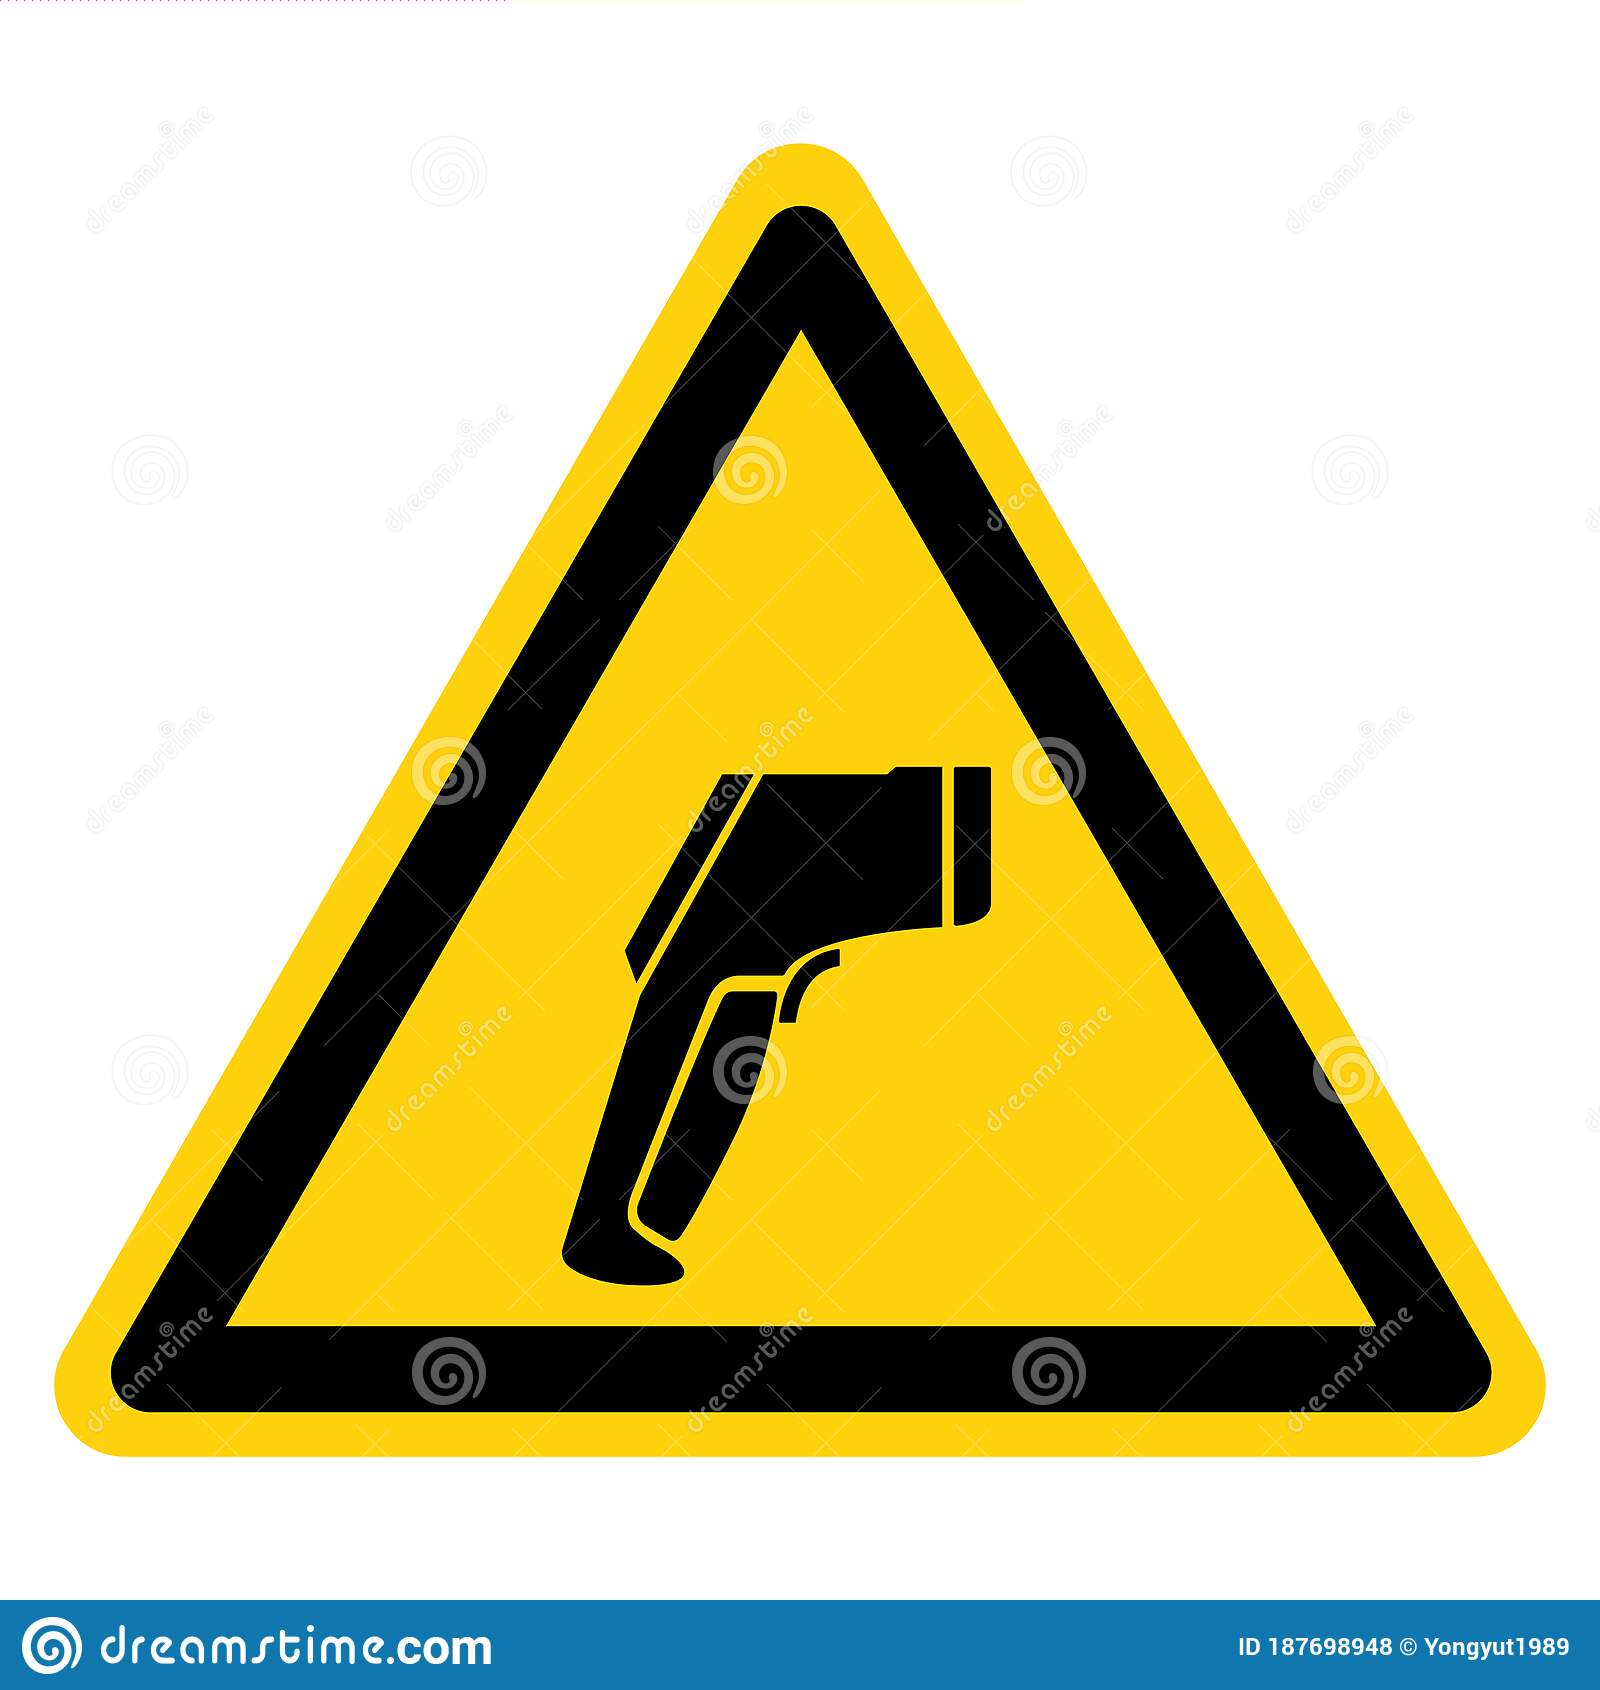 Thermometer Screening Symbol Sign Vector Illustration